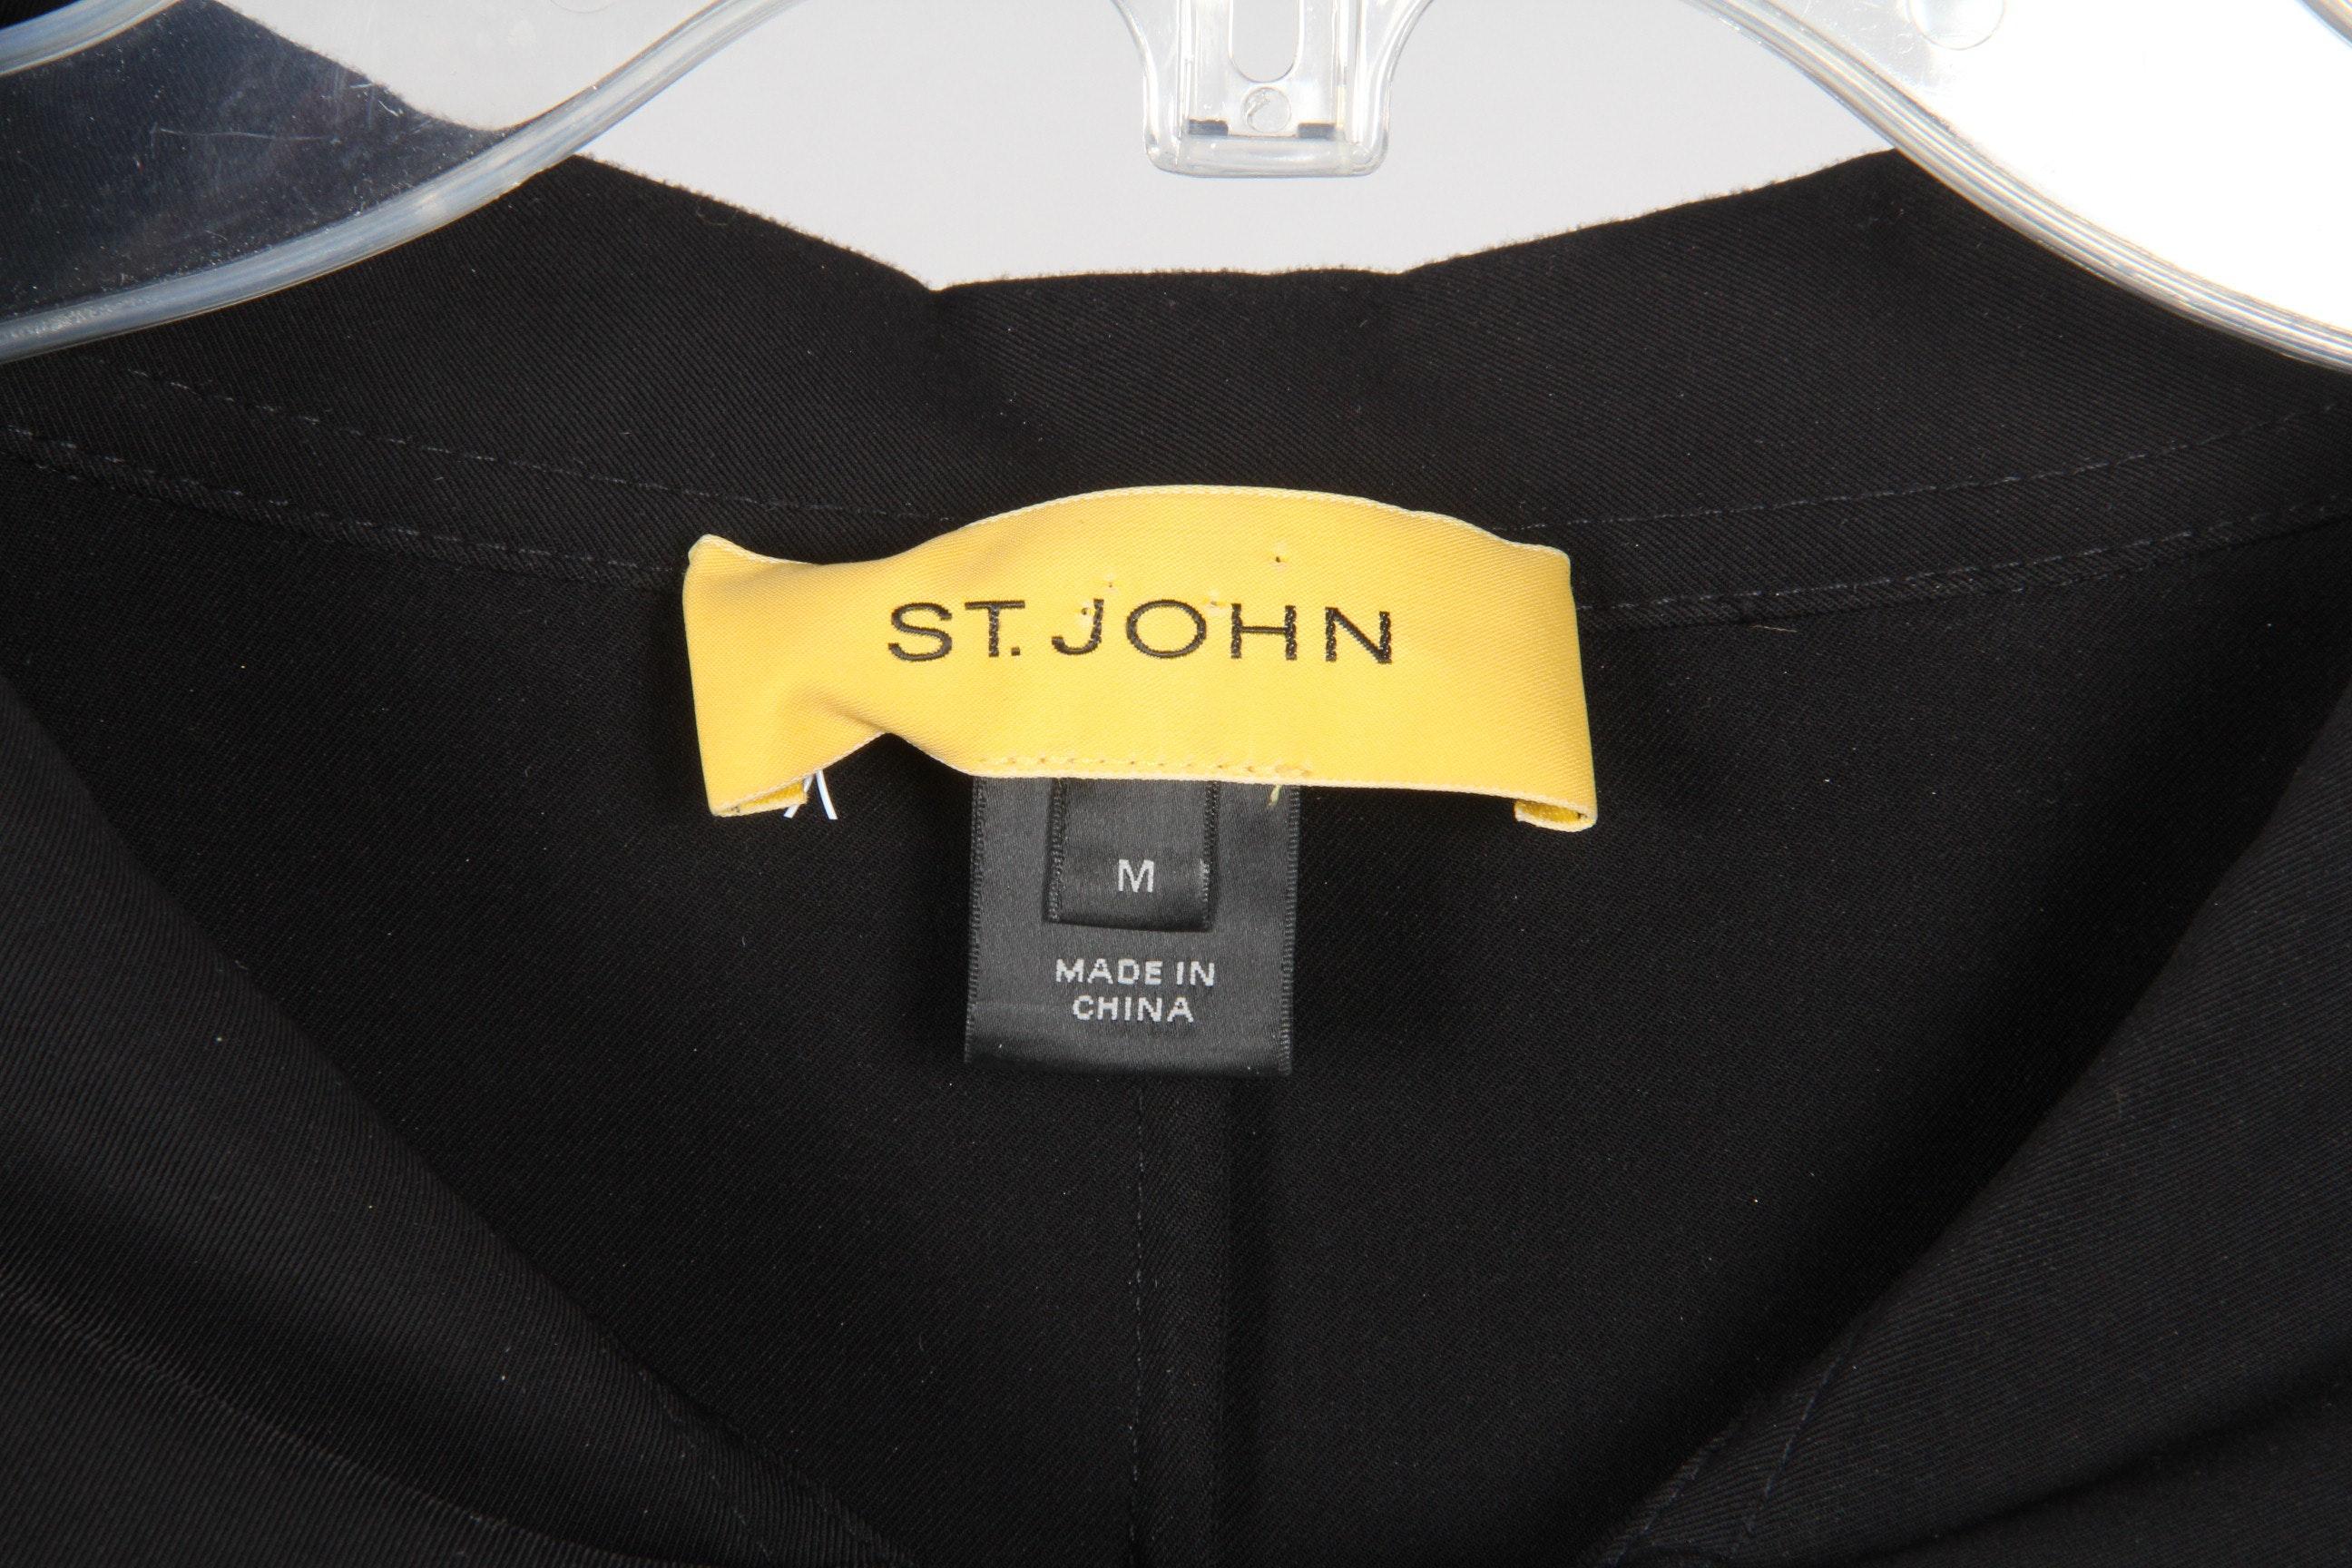 saint johns black single women Single beautitful & realavailable to meet right now ) - woman seeking a man - 32 -  watch you suck a big cock $$ - man seeking a woman - (st john's .